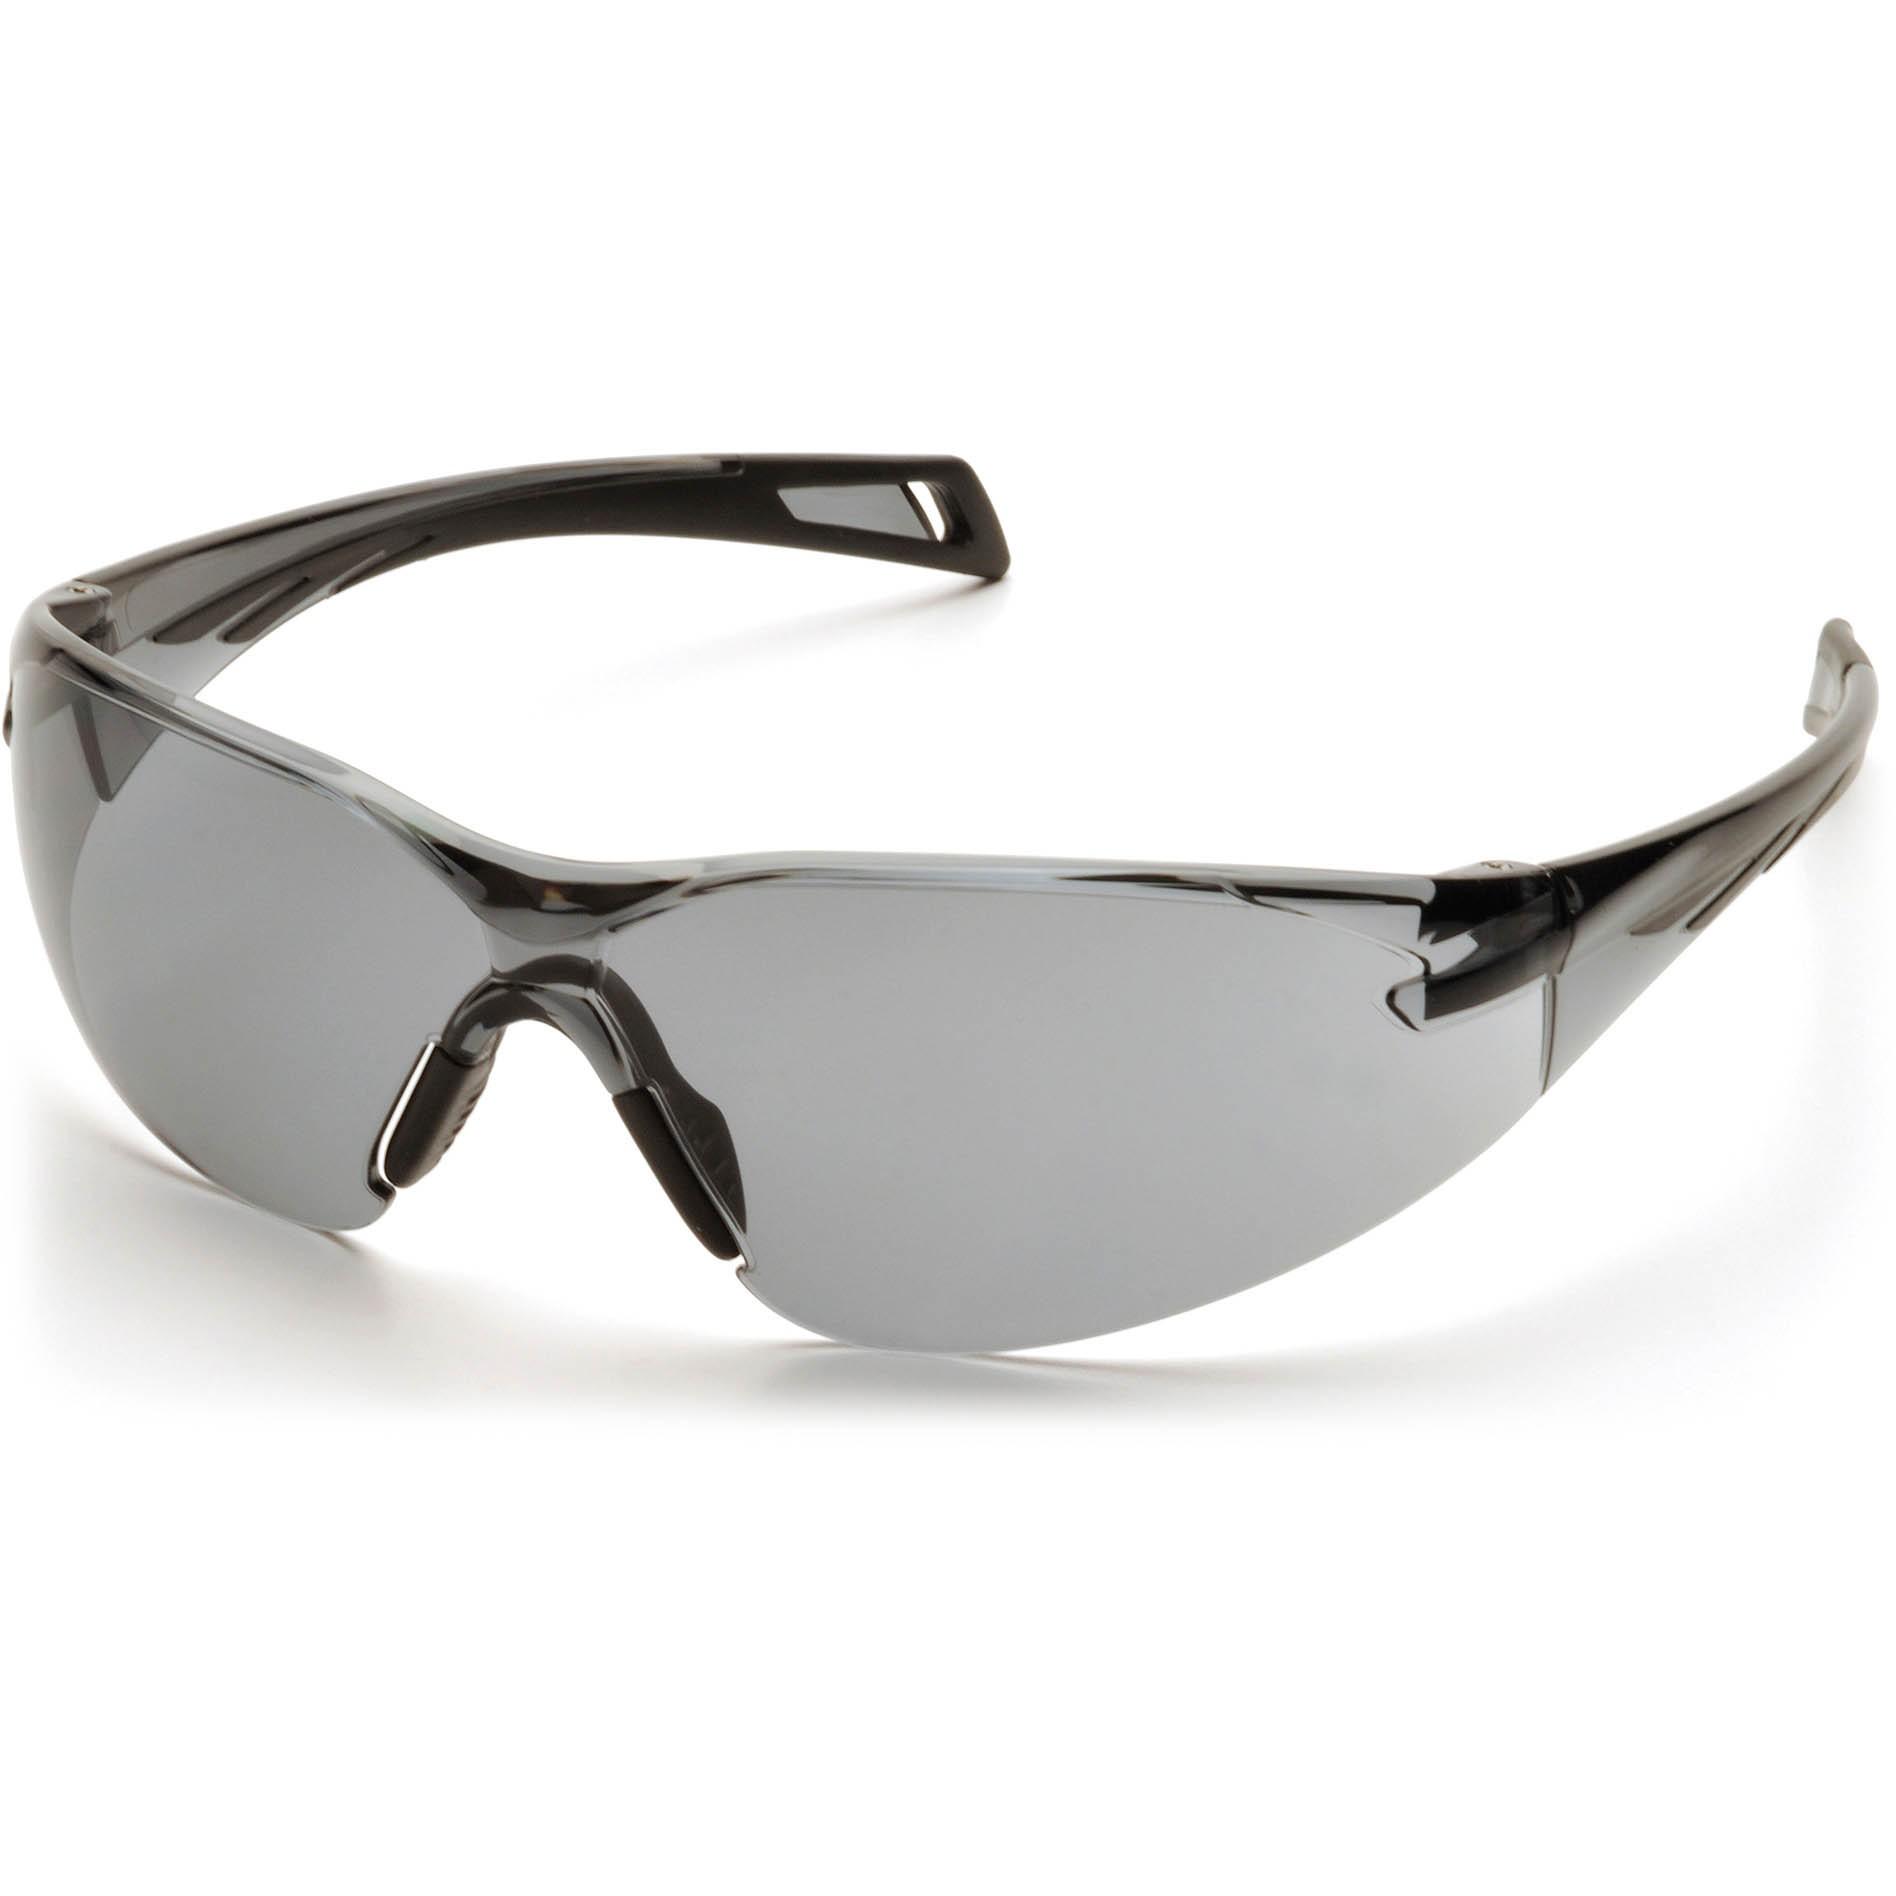 Clip On Side Shields For Sunglasses Www Tapdance Org